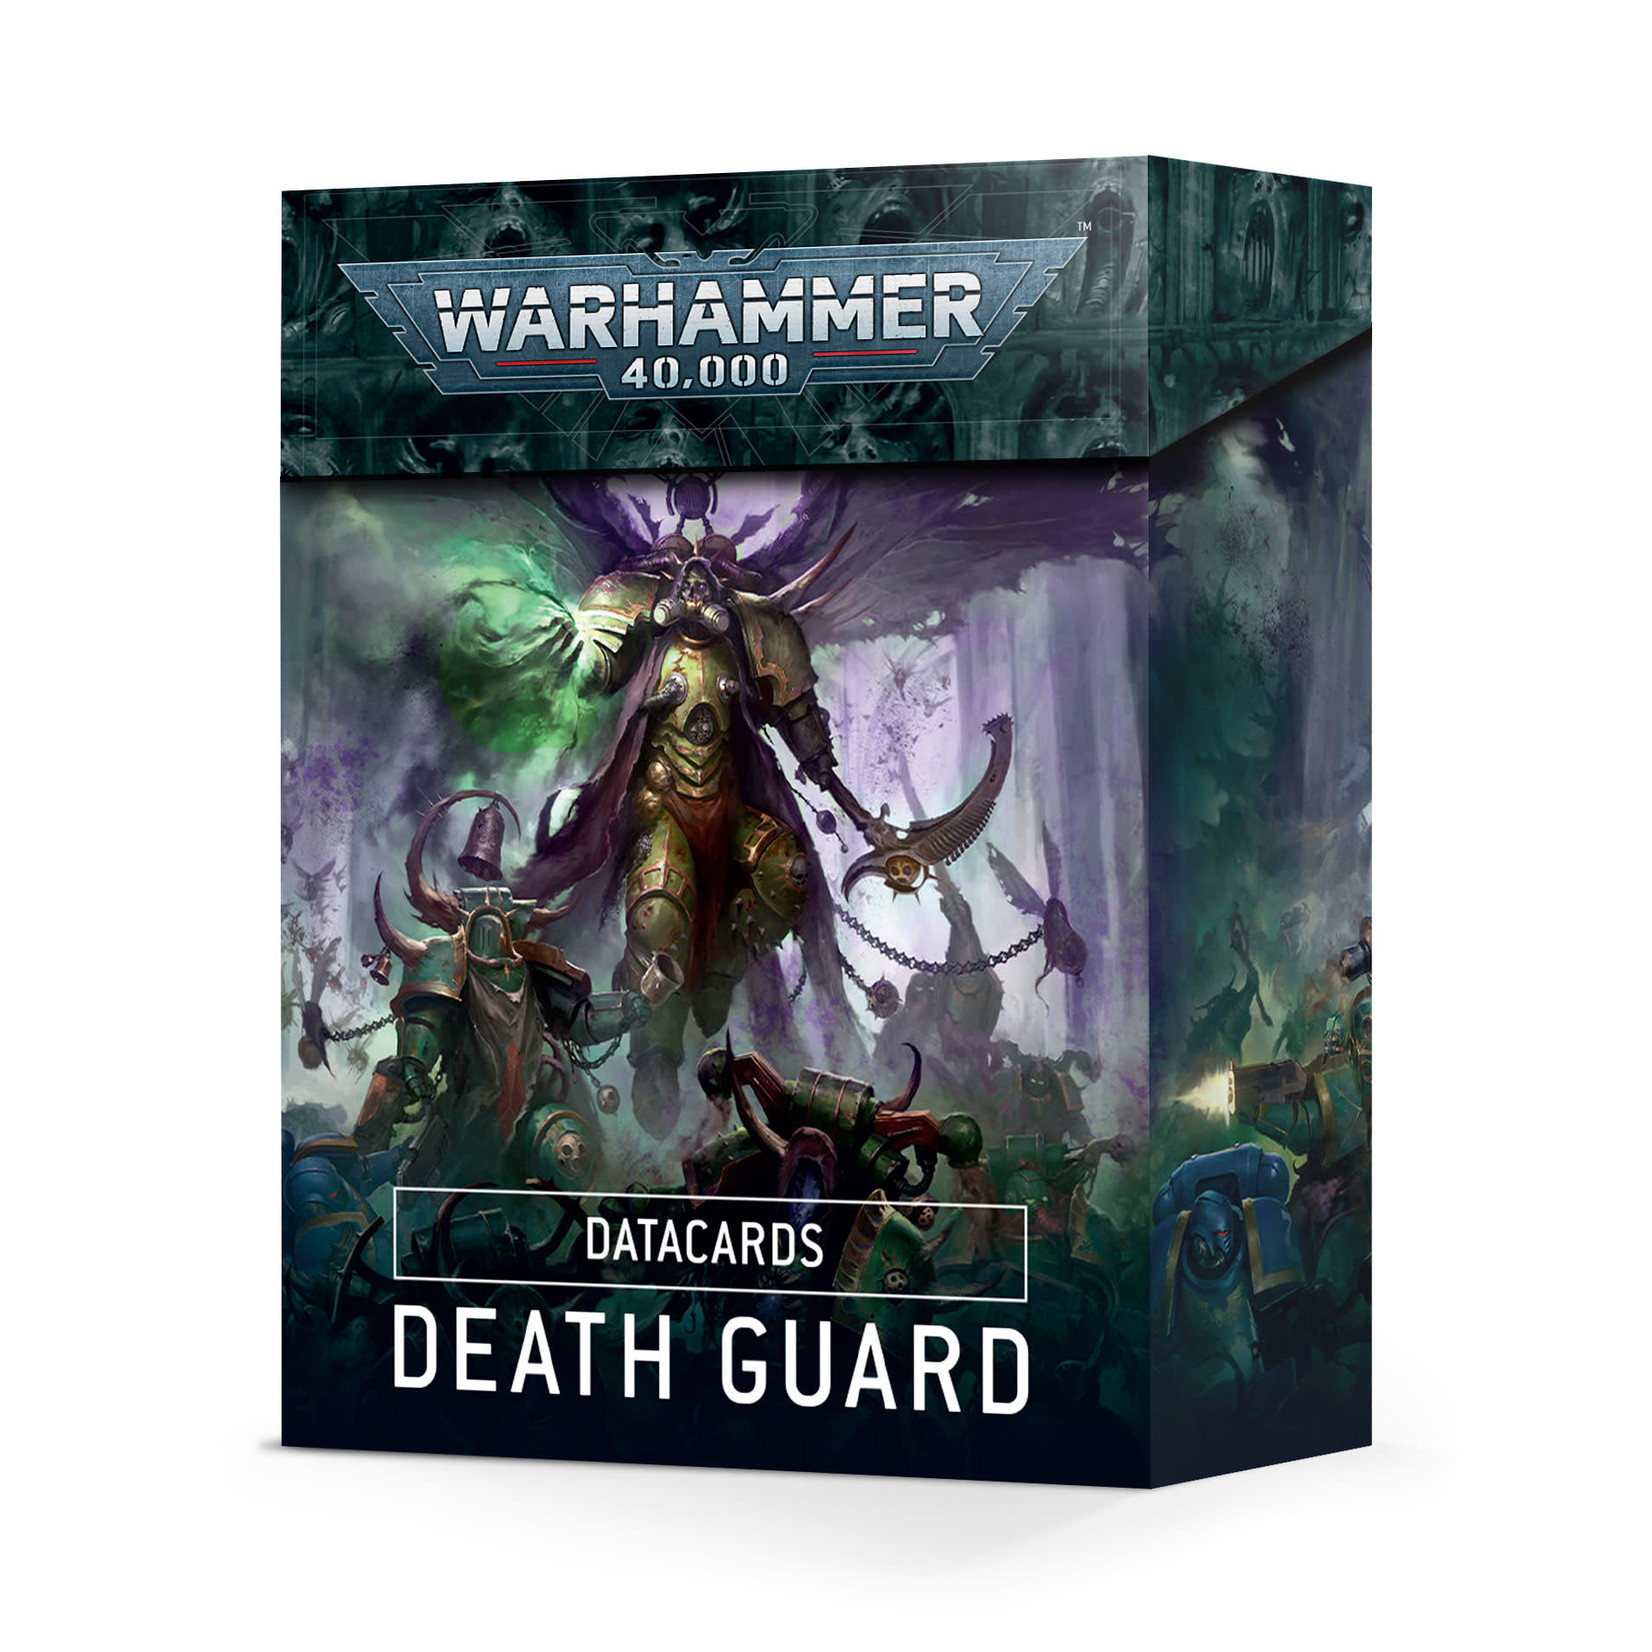 Warhammer 40K Death Guard Datacards (Anglais)